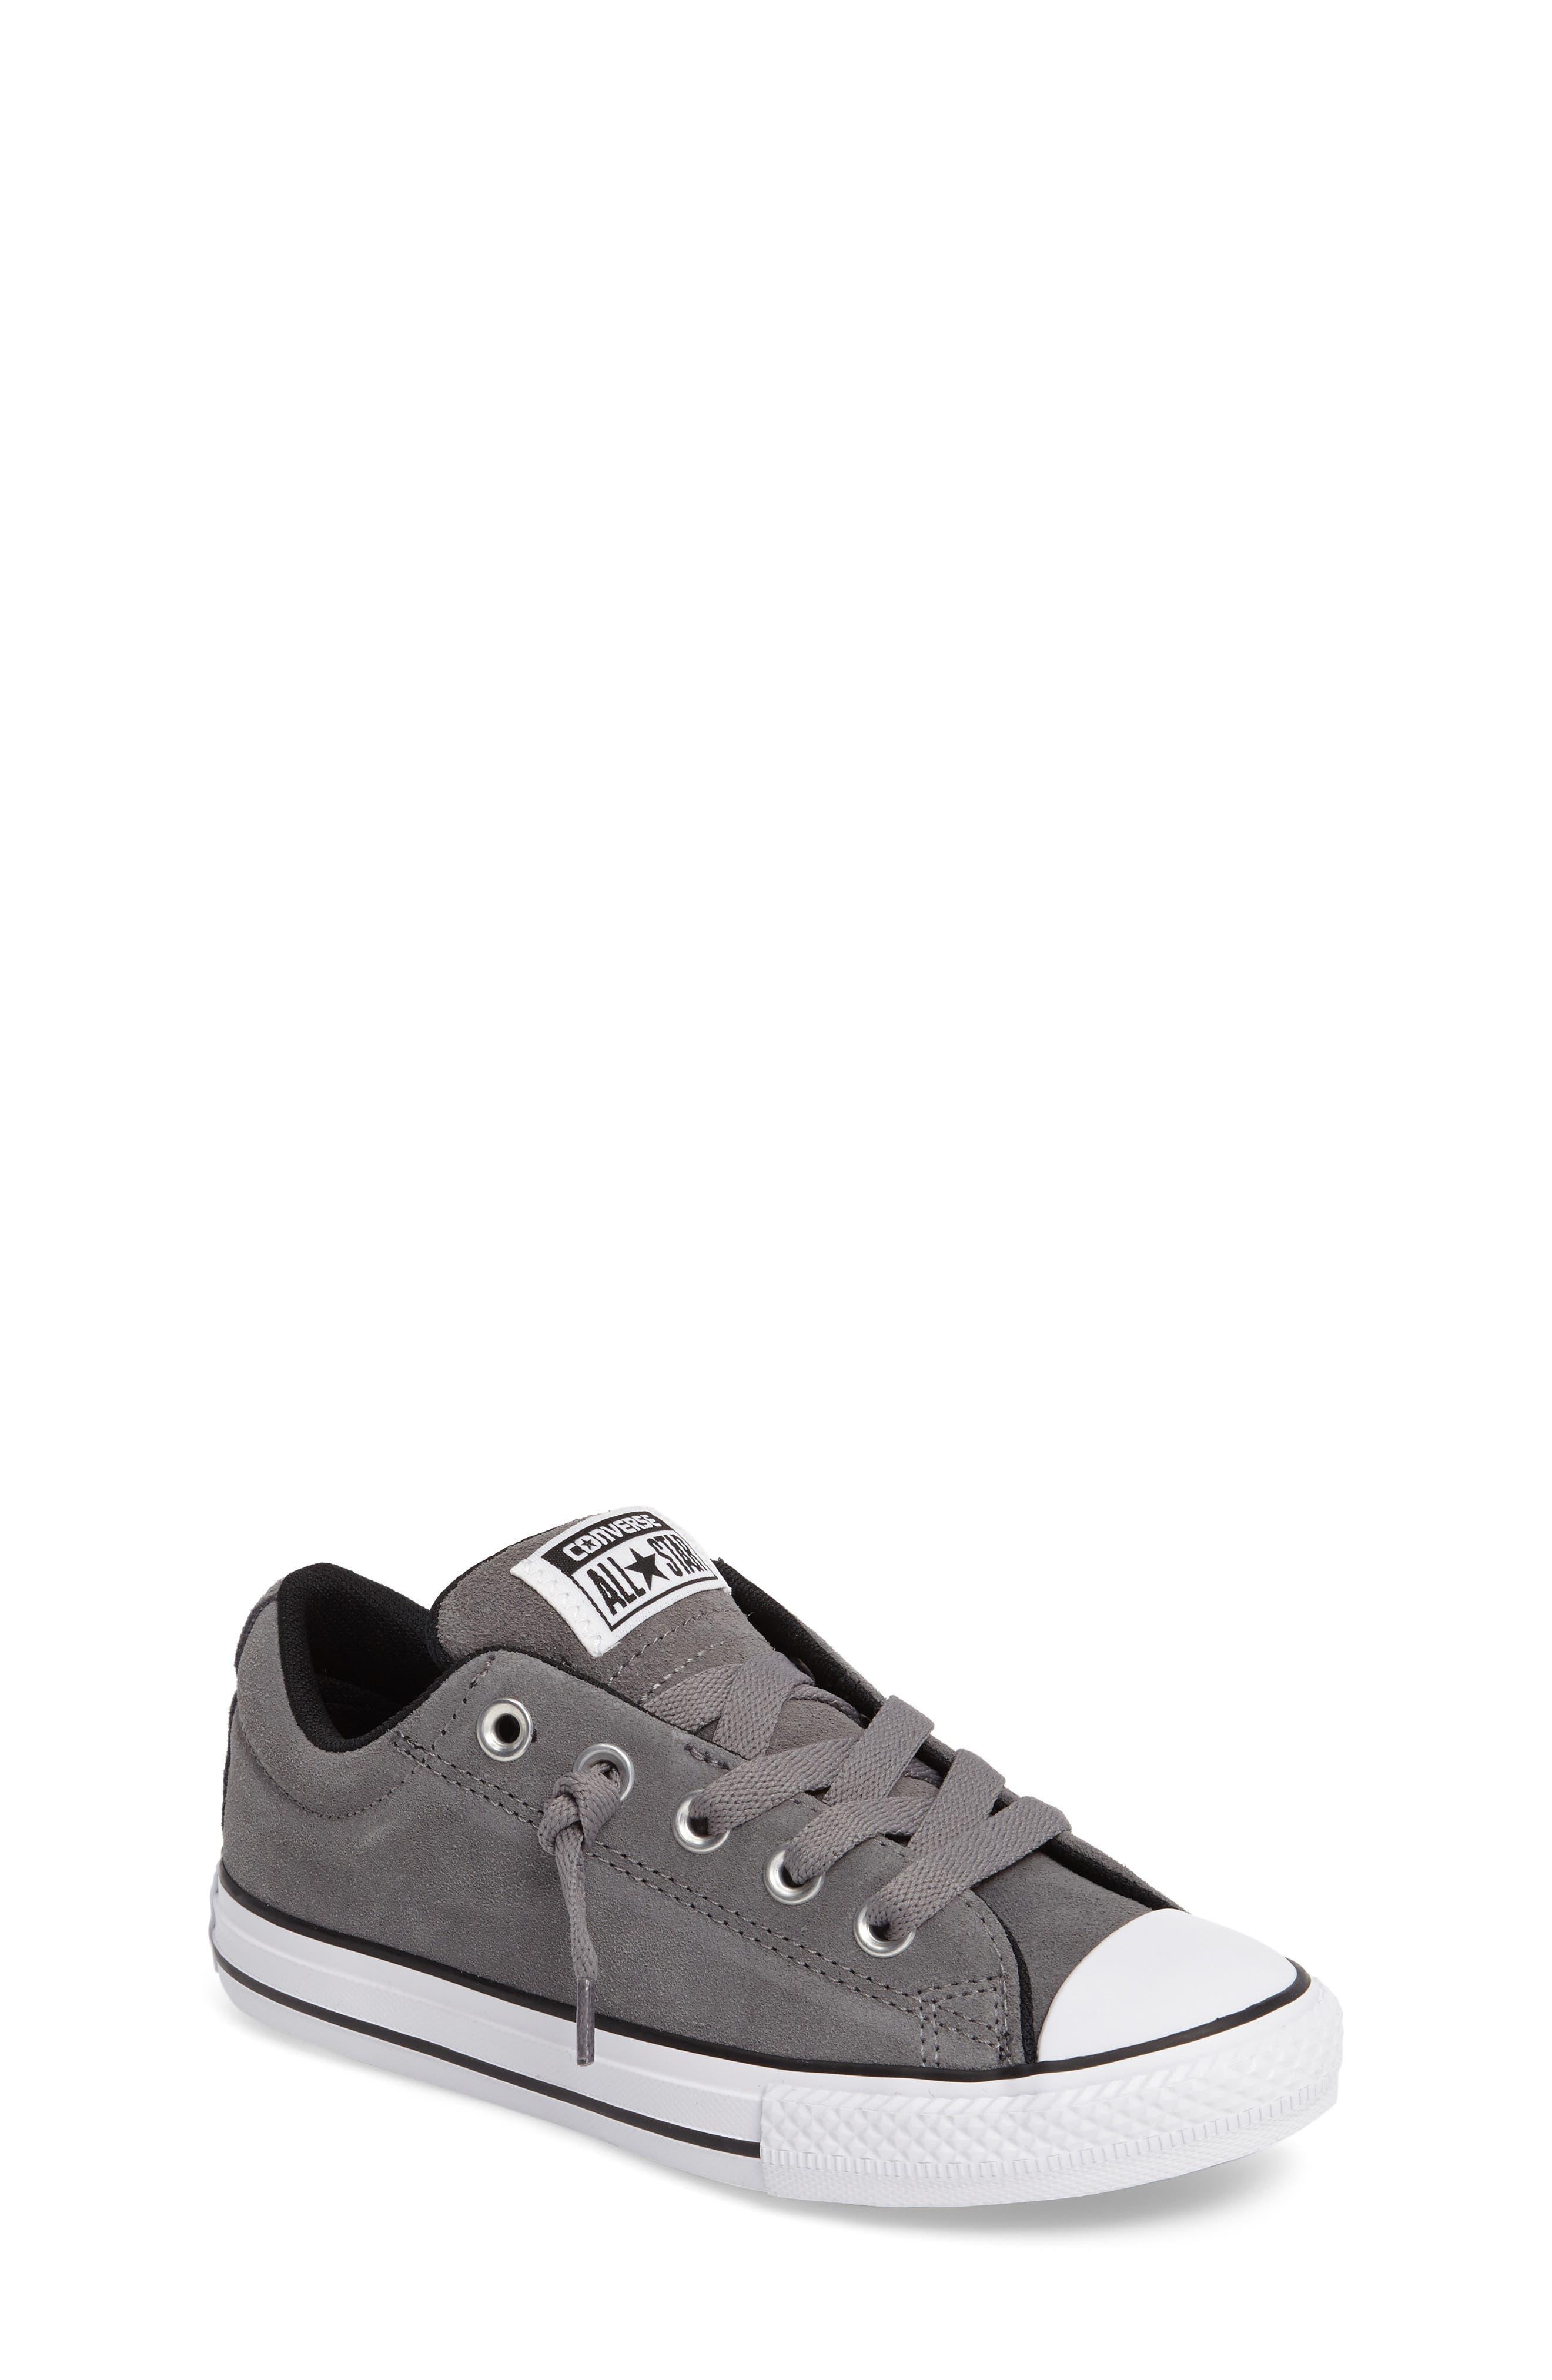 Chuck Taylor<sup>®</sup> All Star<sup>®</sup> Street Sneaker,                         Main,                         color, Mason/ Black/ White